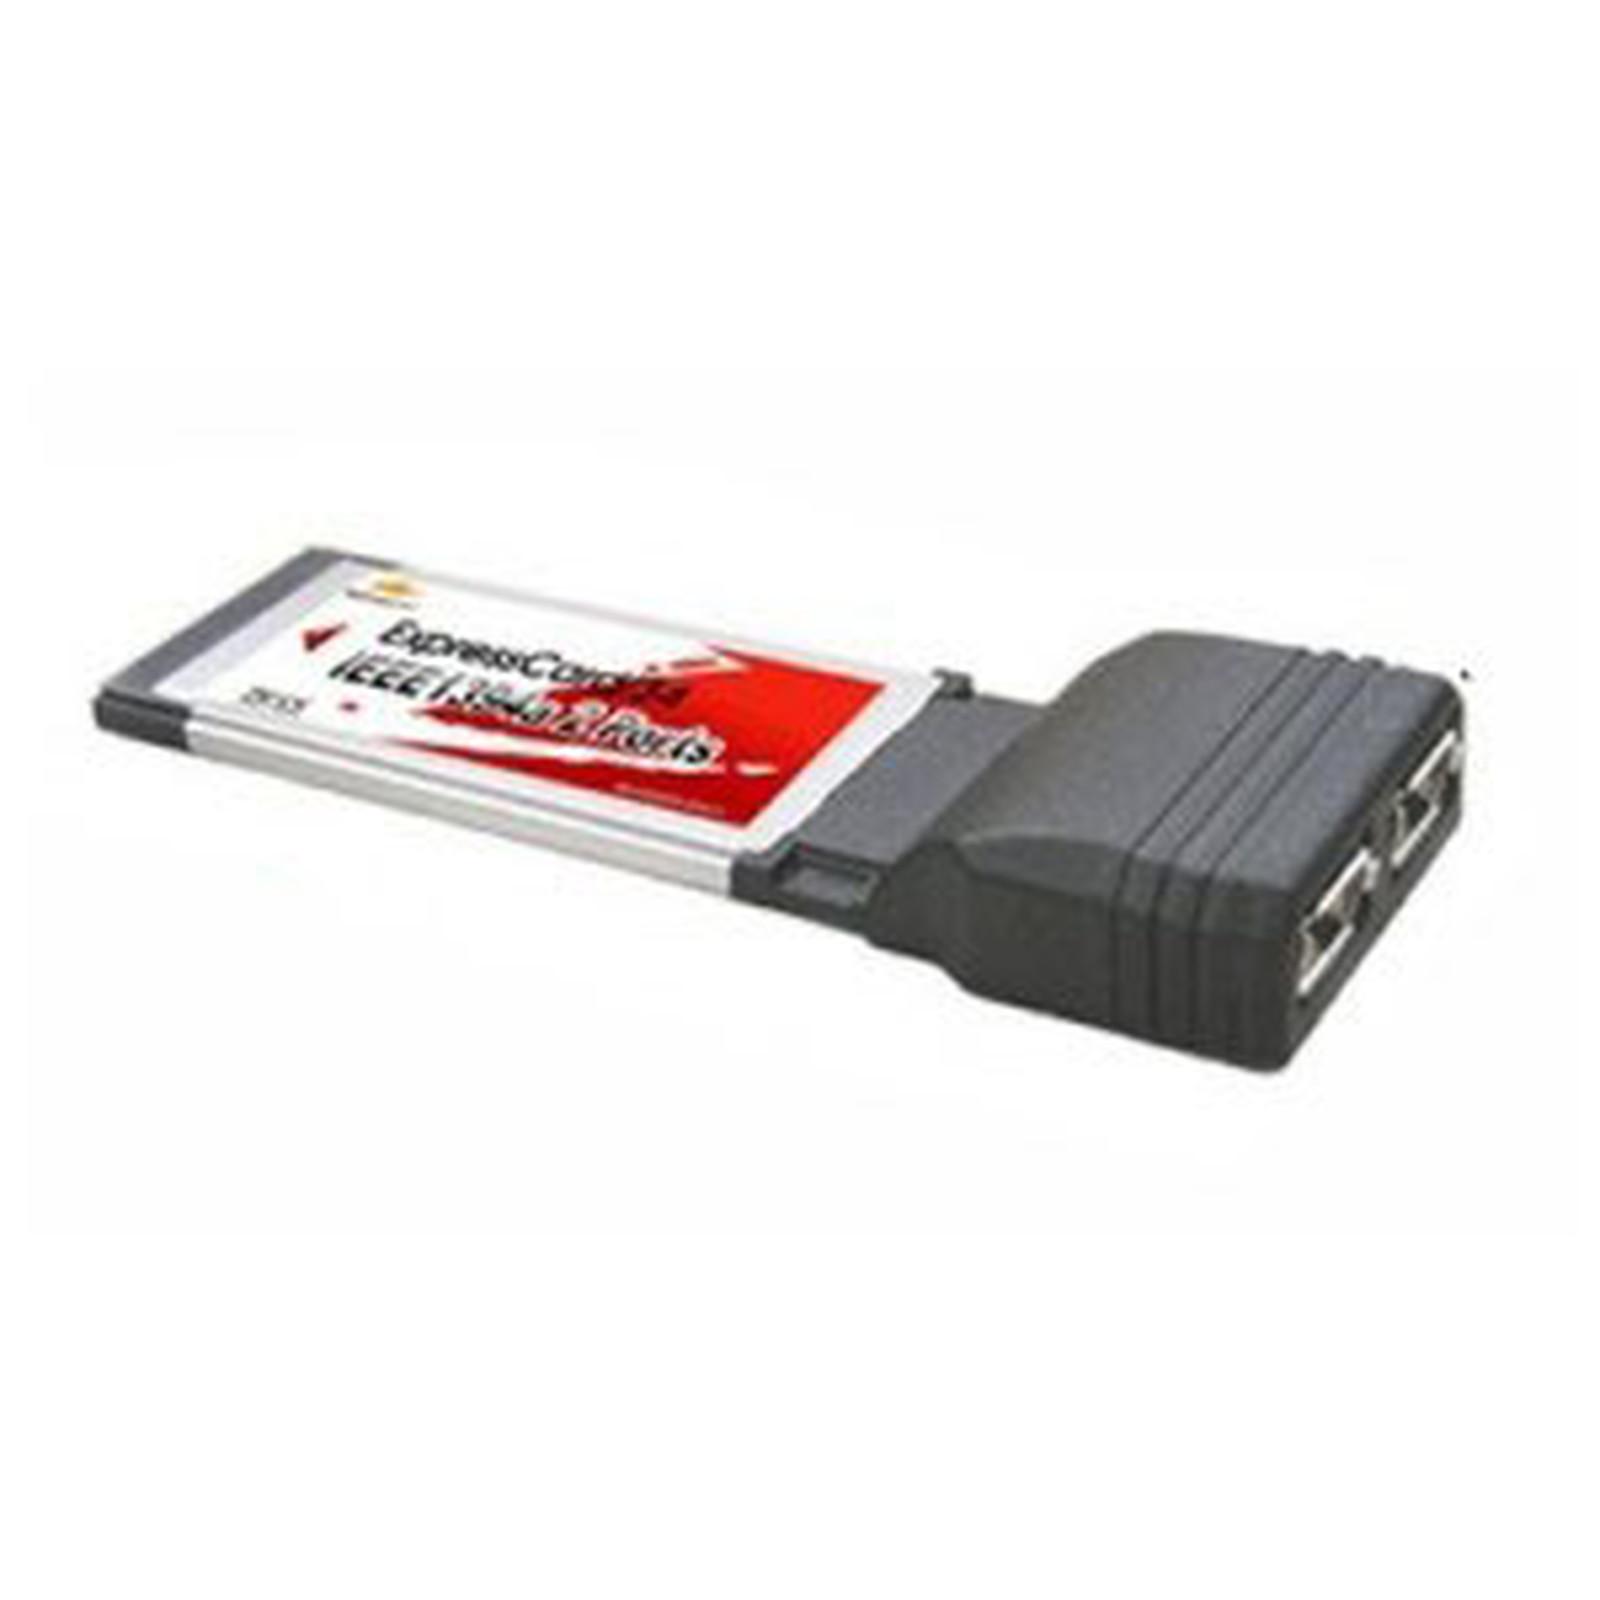 Carte contrôleur ExpressCard avec 2 ports FireWire 400